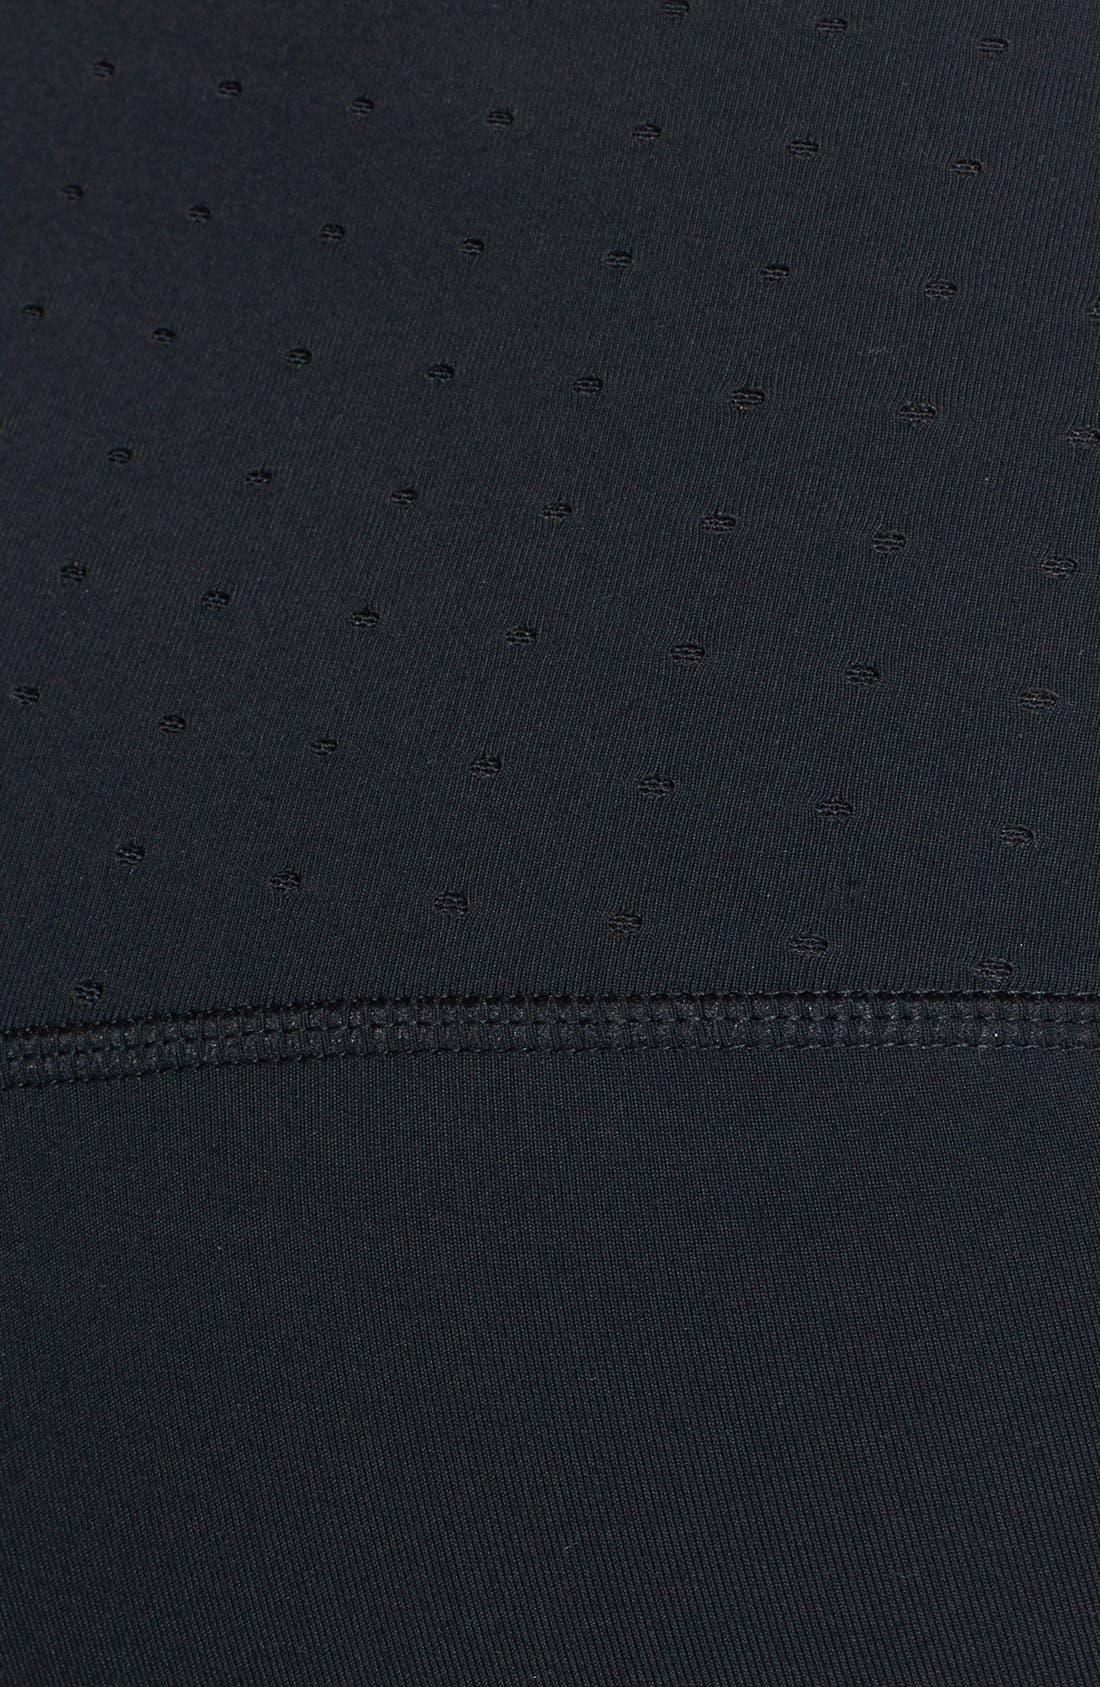 Alternate Image 3  - Nike 'Sculpt' Dri-FIT Training Capris